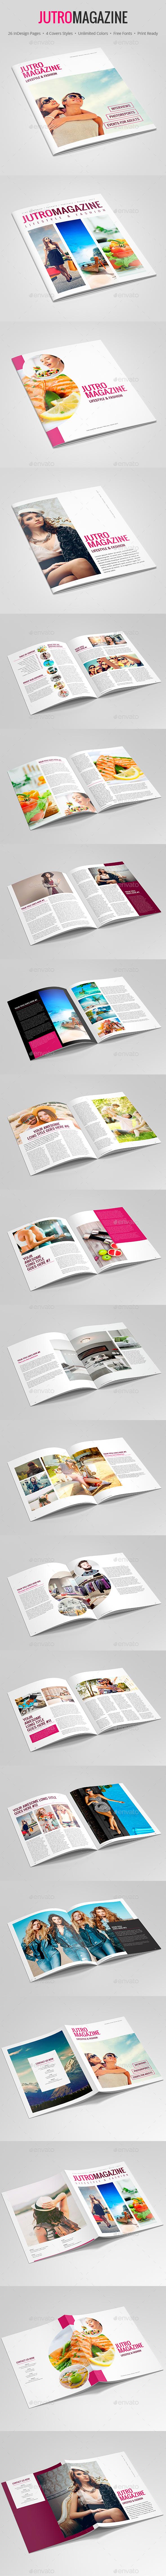 Jutro Magazine – Lifestyle and Fashion - Magazines Print Templates